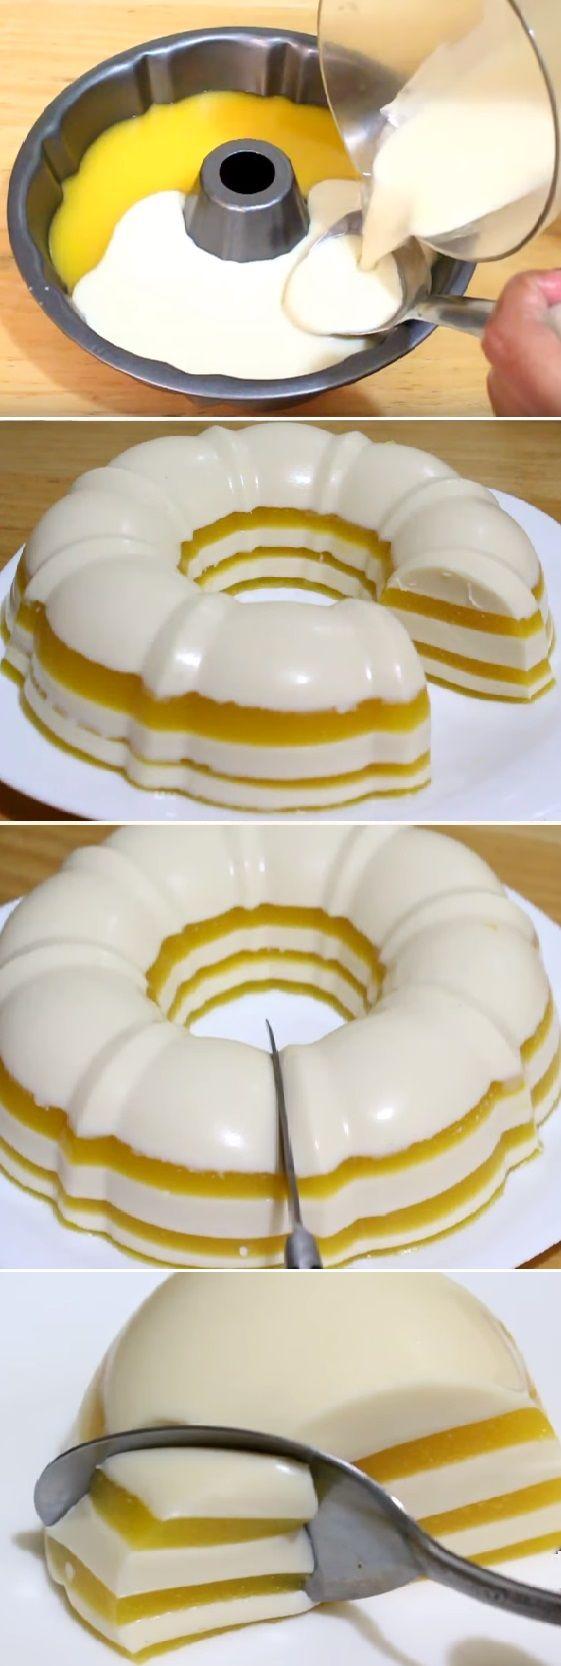 "GELATINA DE TRES LECHES Y DURAZNO "" By Alejandra de Nava. #gelatina #tresleches #durazno #gelato #flan #postres #cheesecake #cakes #pan #panfrances #panettone #panes #pantone #pan #recetas #recipe #casero #torta #tartas #pastel #nestlecocina #bizcocho #bizcochuelo #tasty #cocina #chocolate Si te gusta dinos HOLA y dale a Me Gusta MIREN..."